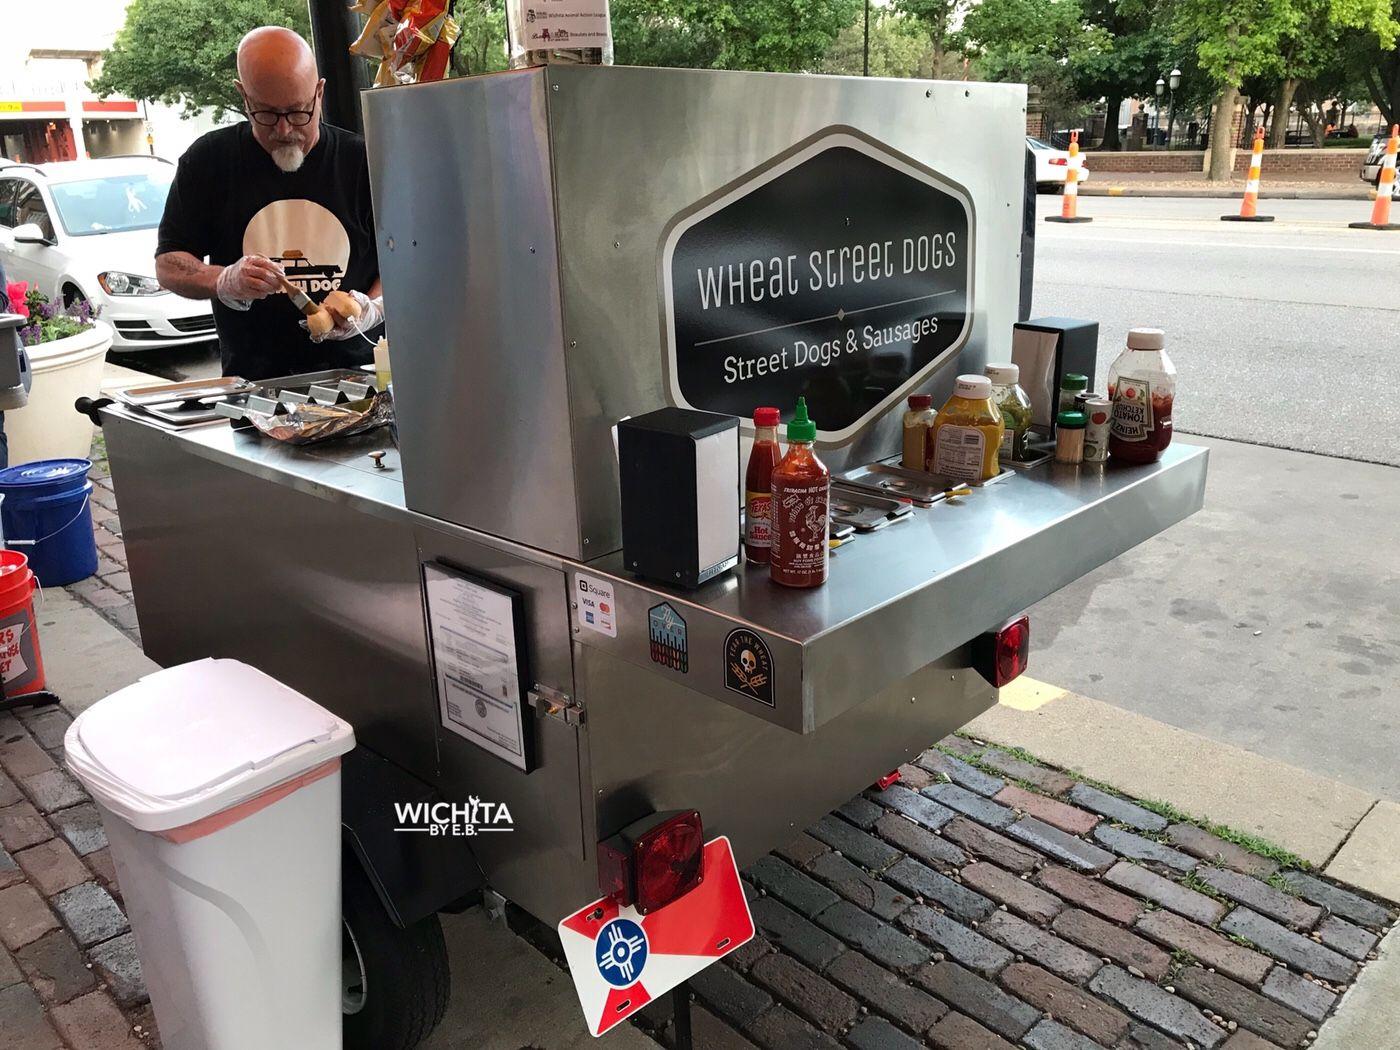 Wheat Street Dogs Vegan Hot Dog Cart That Ll Surprise You Wichita By E B Vegan Hot Dog Hot Dog Cart Hot Dogs